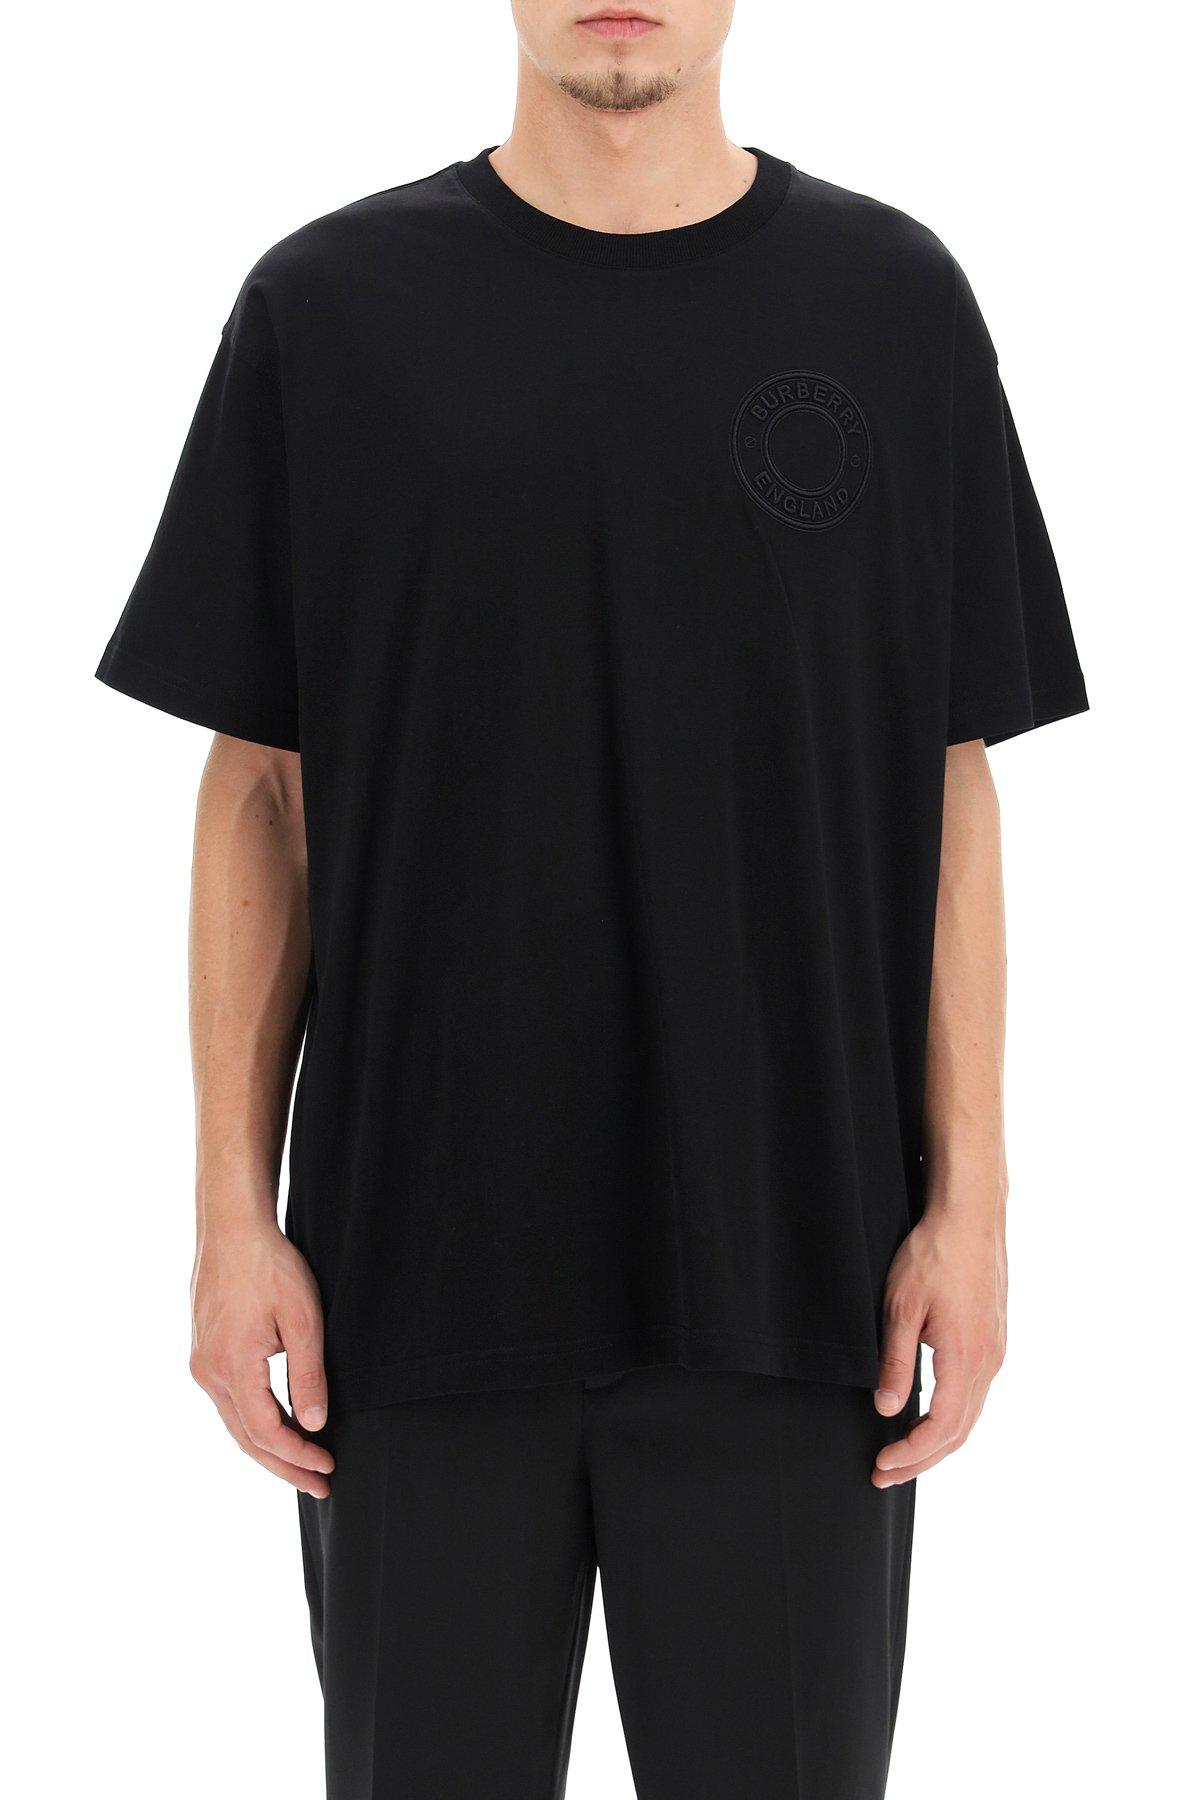 Burberry t-shirt over ronin ricamo logo